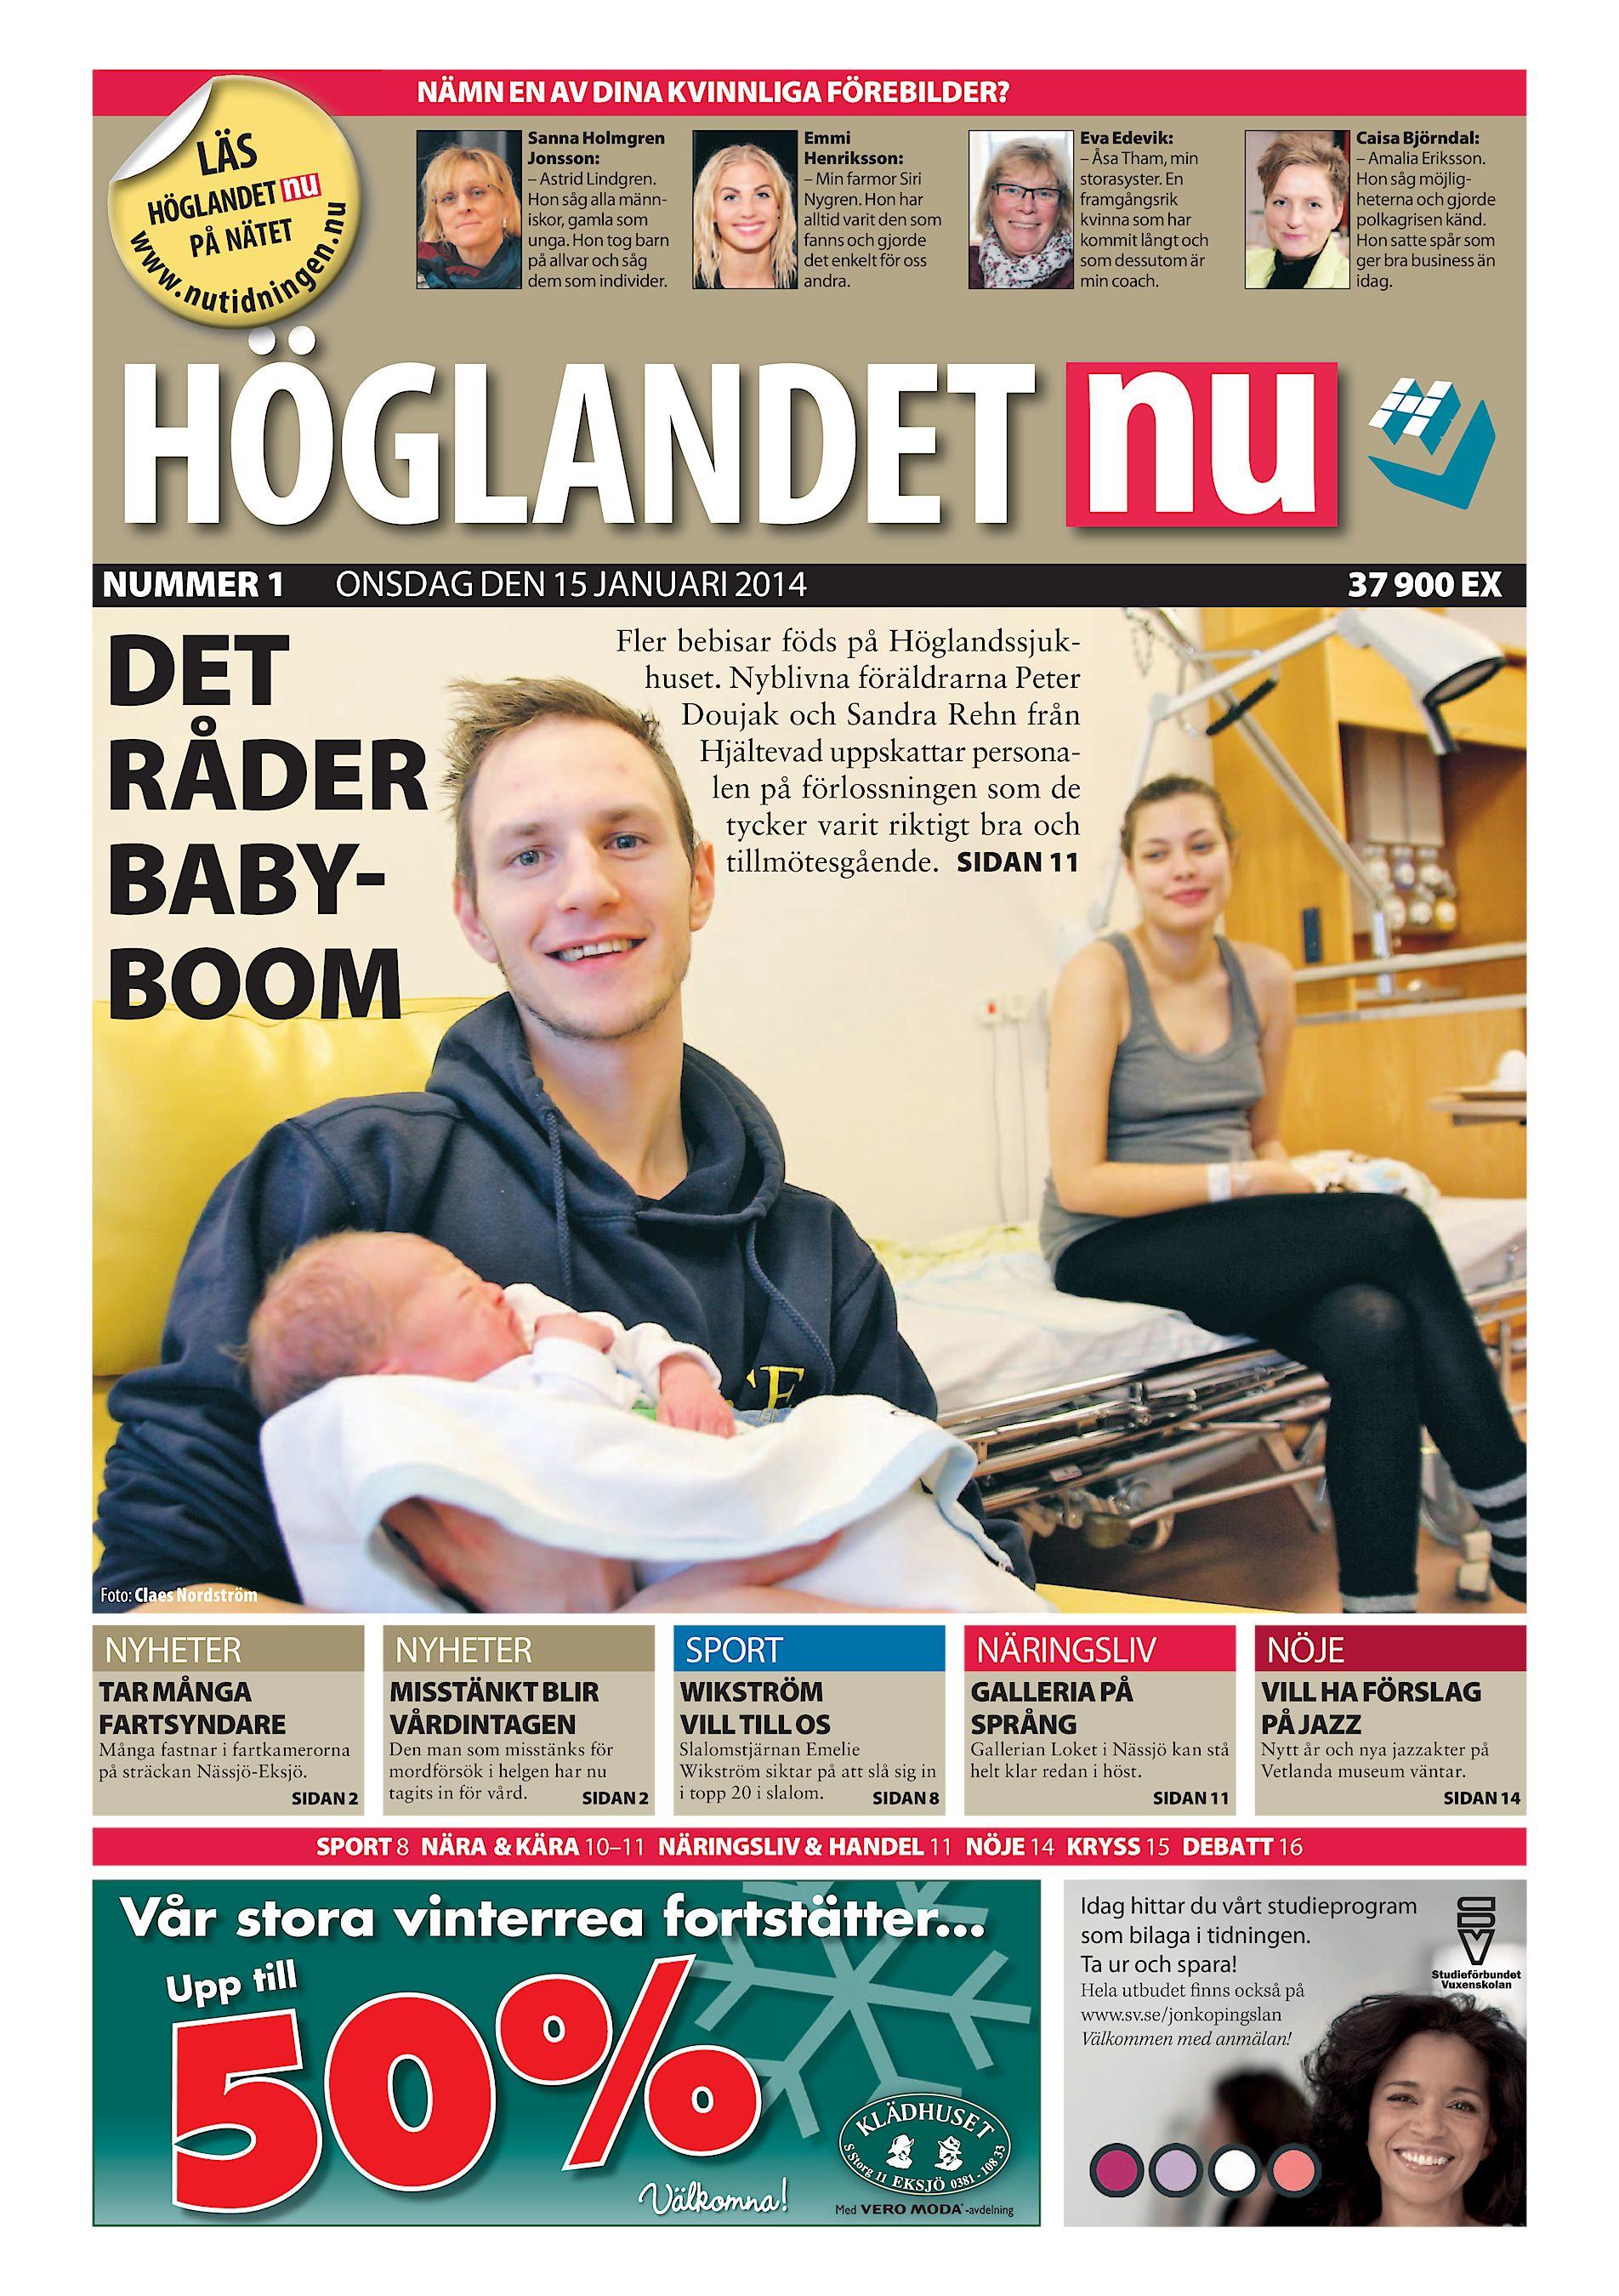 Vm gladje gav tysk babyboom